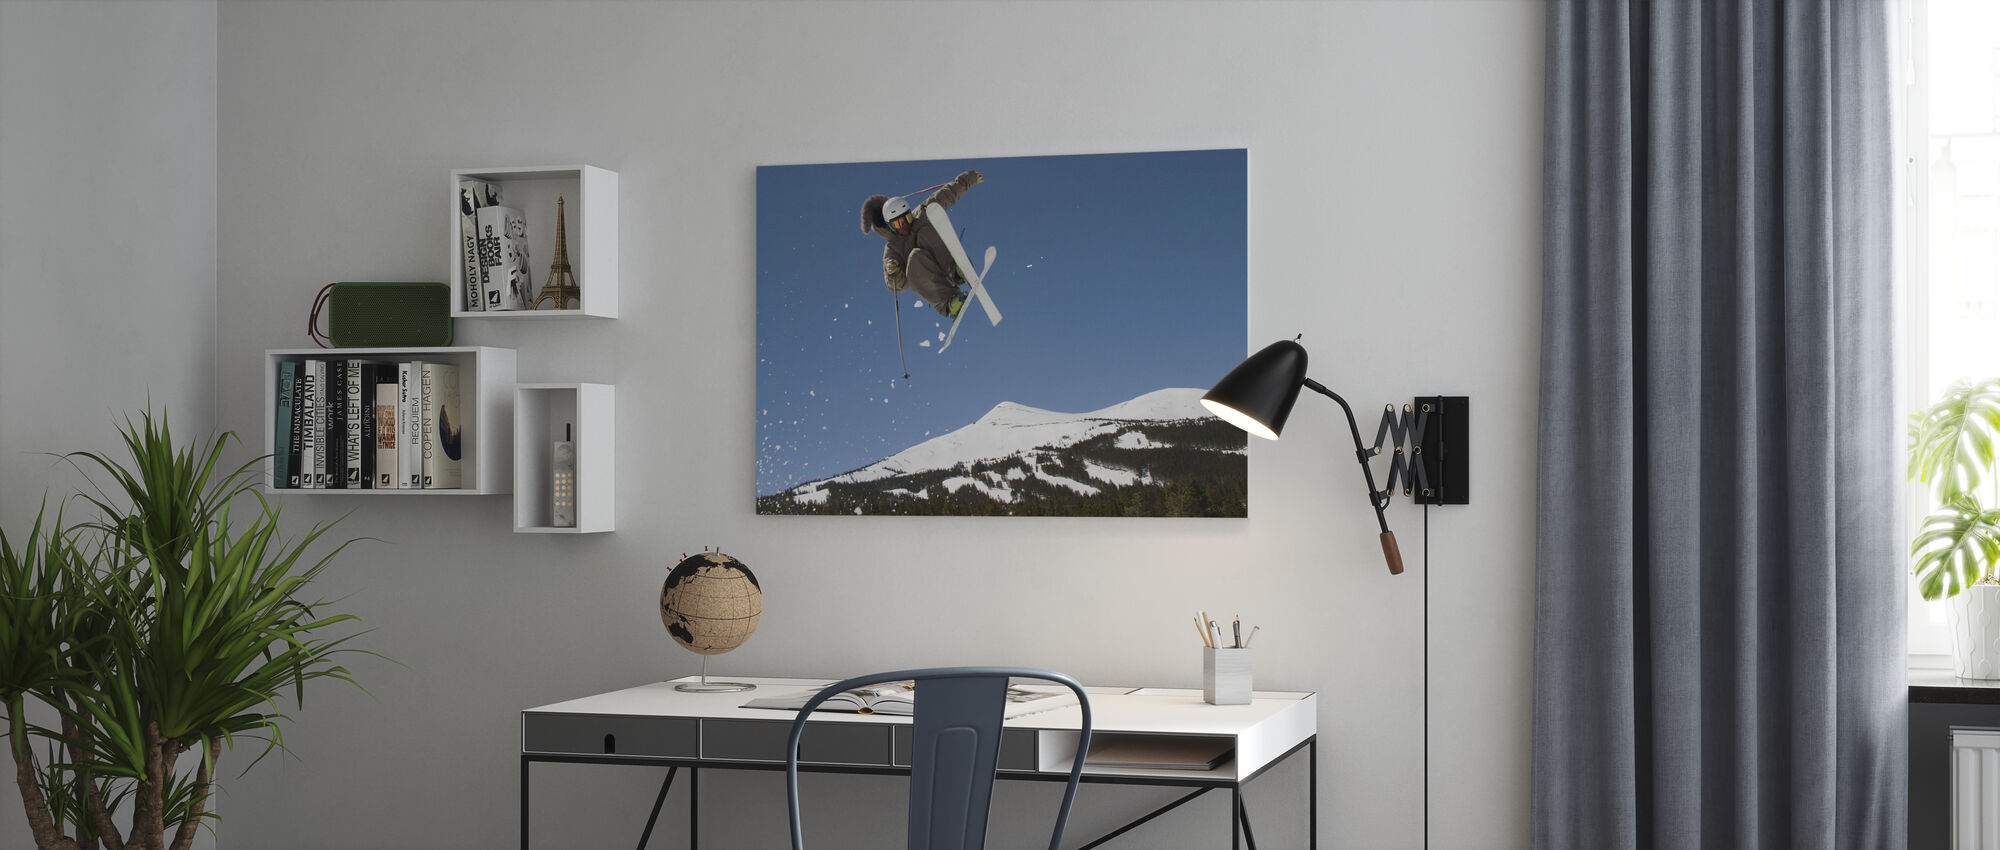 Superpipe skiløper - Lerretsbilde - Kontor